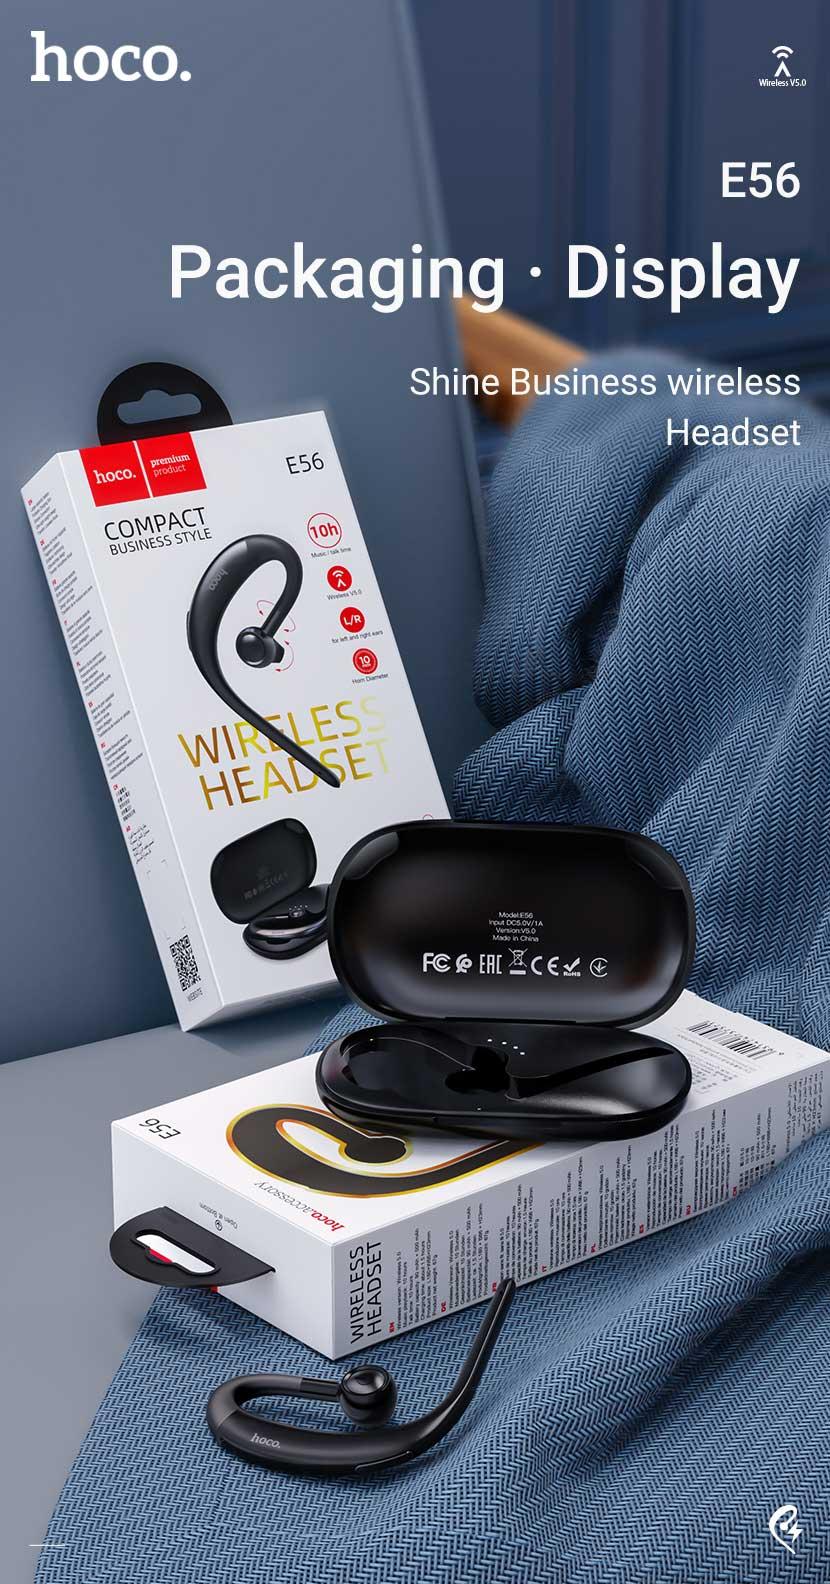 hoco news e56 shine business wireless headset package en